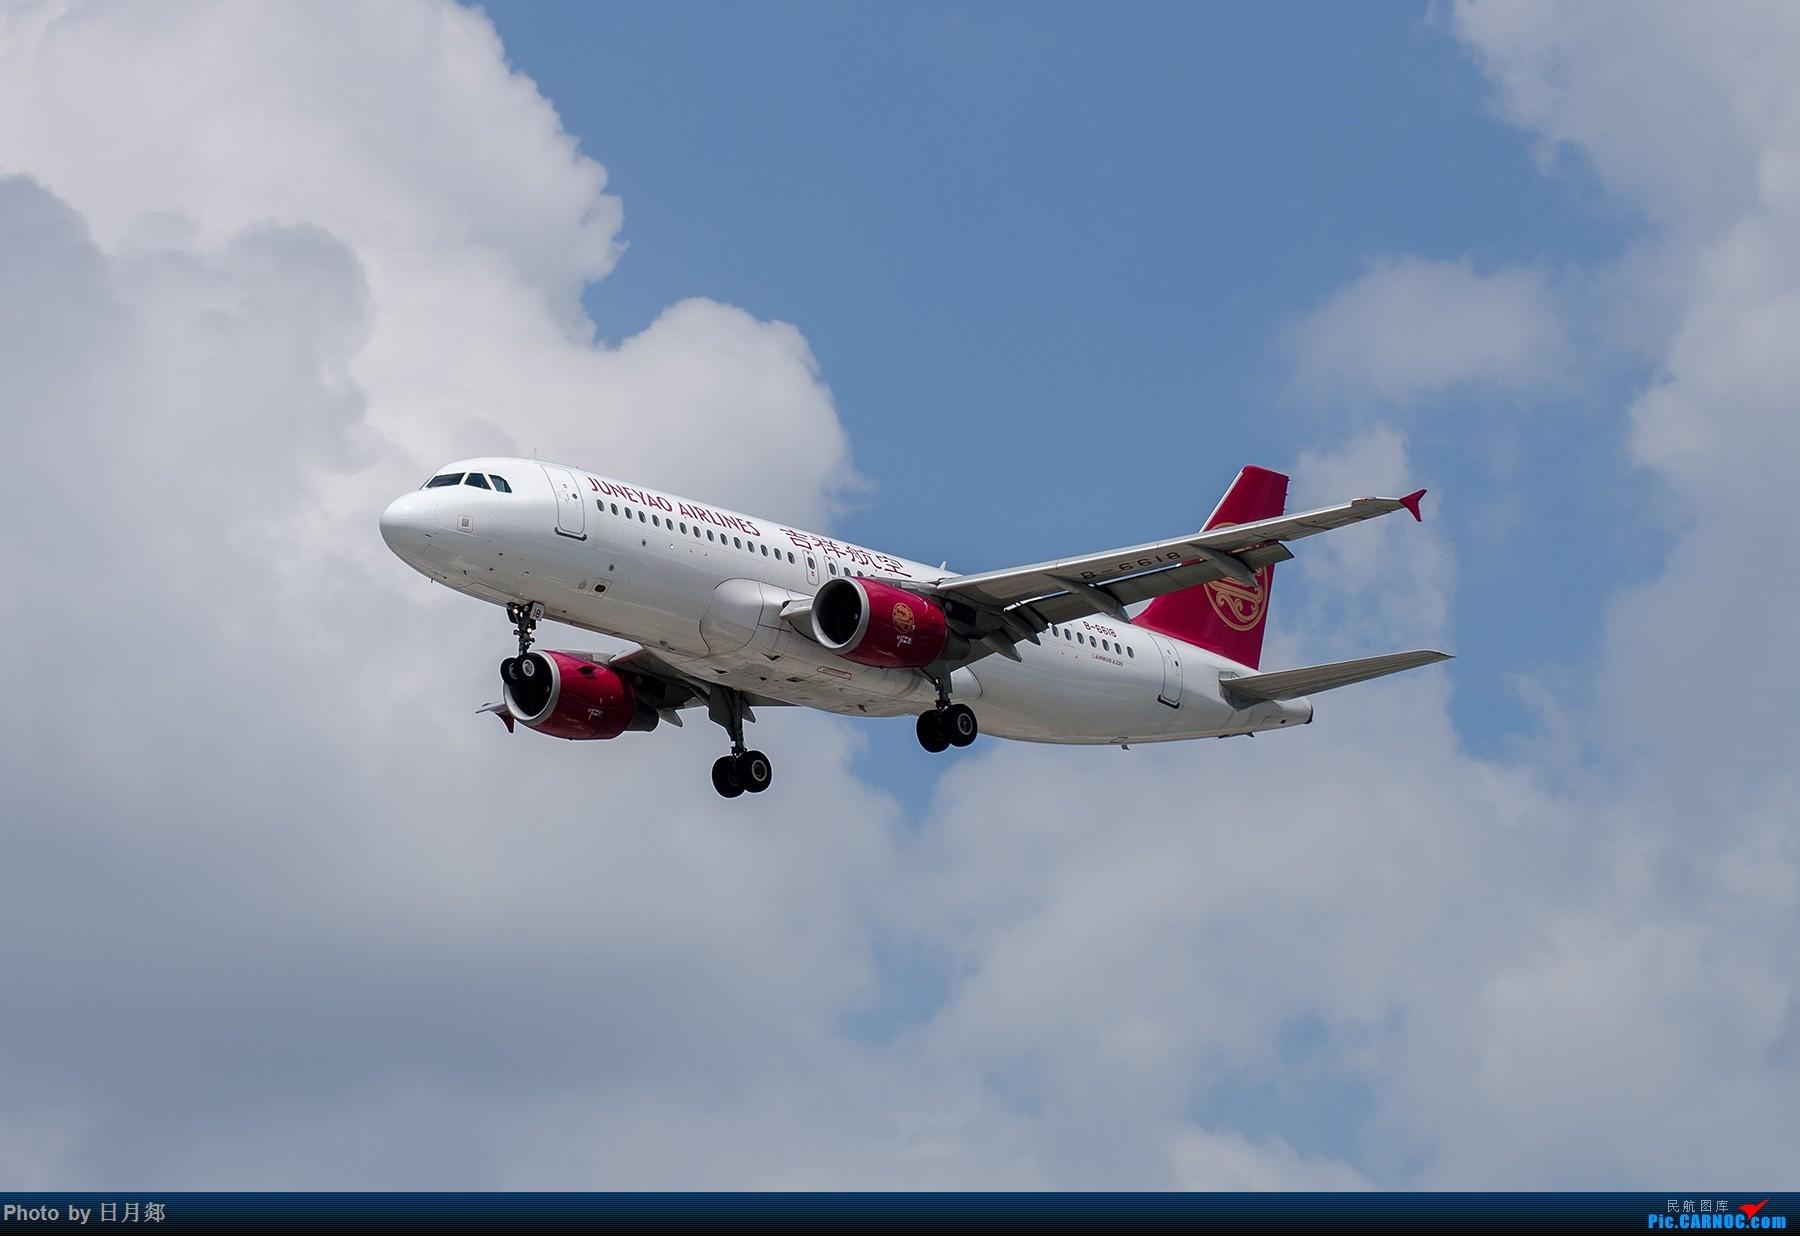 Re:[原创]【SHA拍机*1800大图】图要抓紧发,不然就要炒冷饭,大头镇贴 AIRBUS A320-200 B-6618 中国上海虹桥国际机场